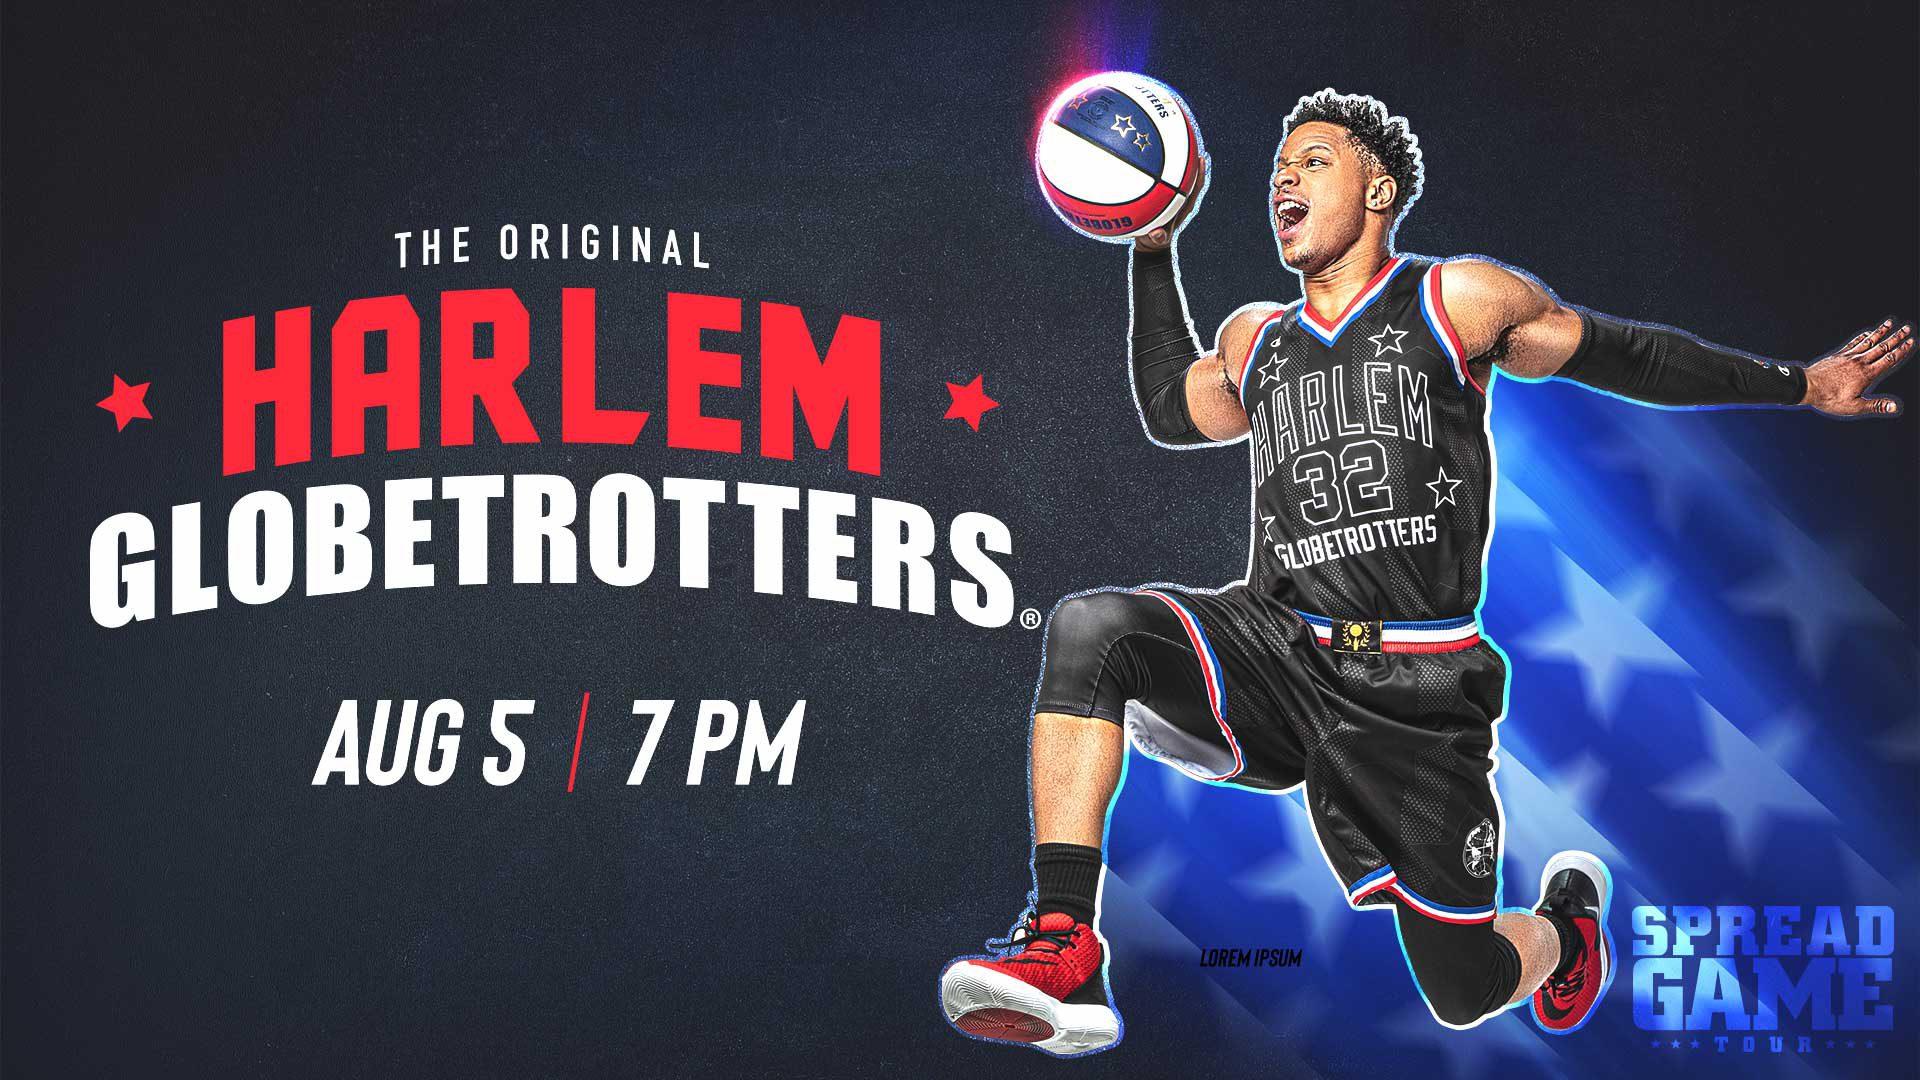 Harlem Globetrotters - August 5 - 7 PM